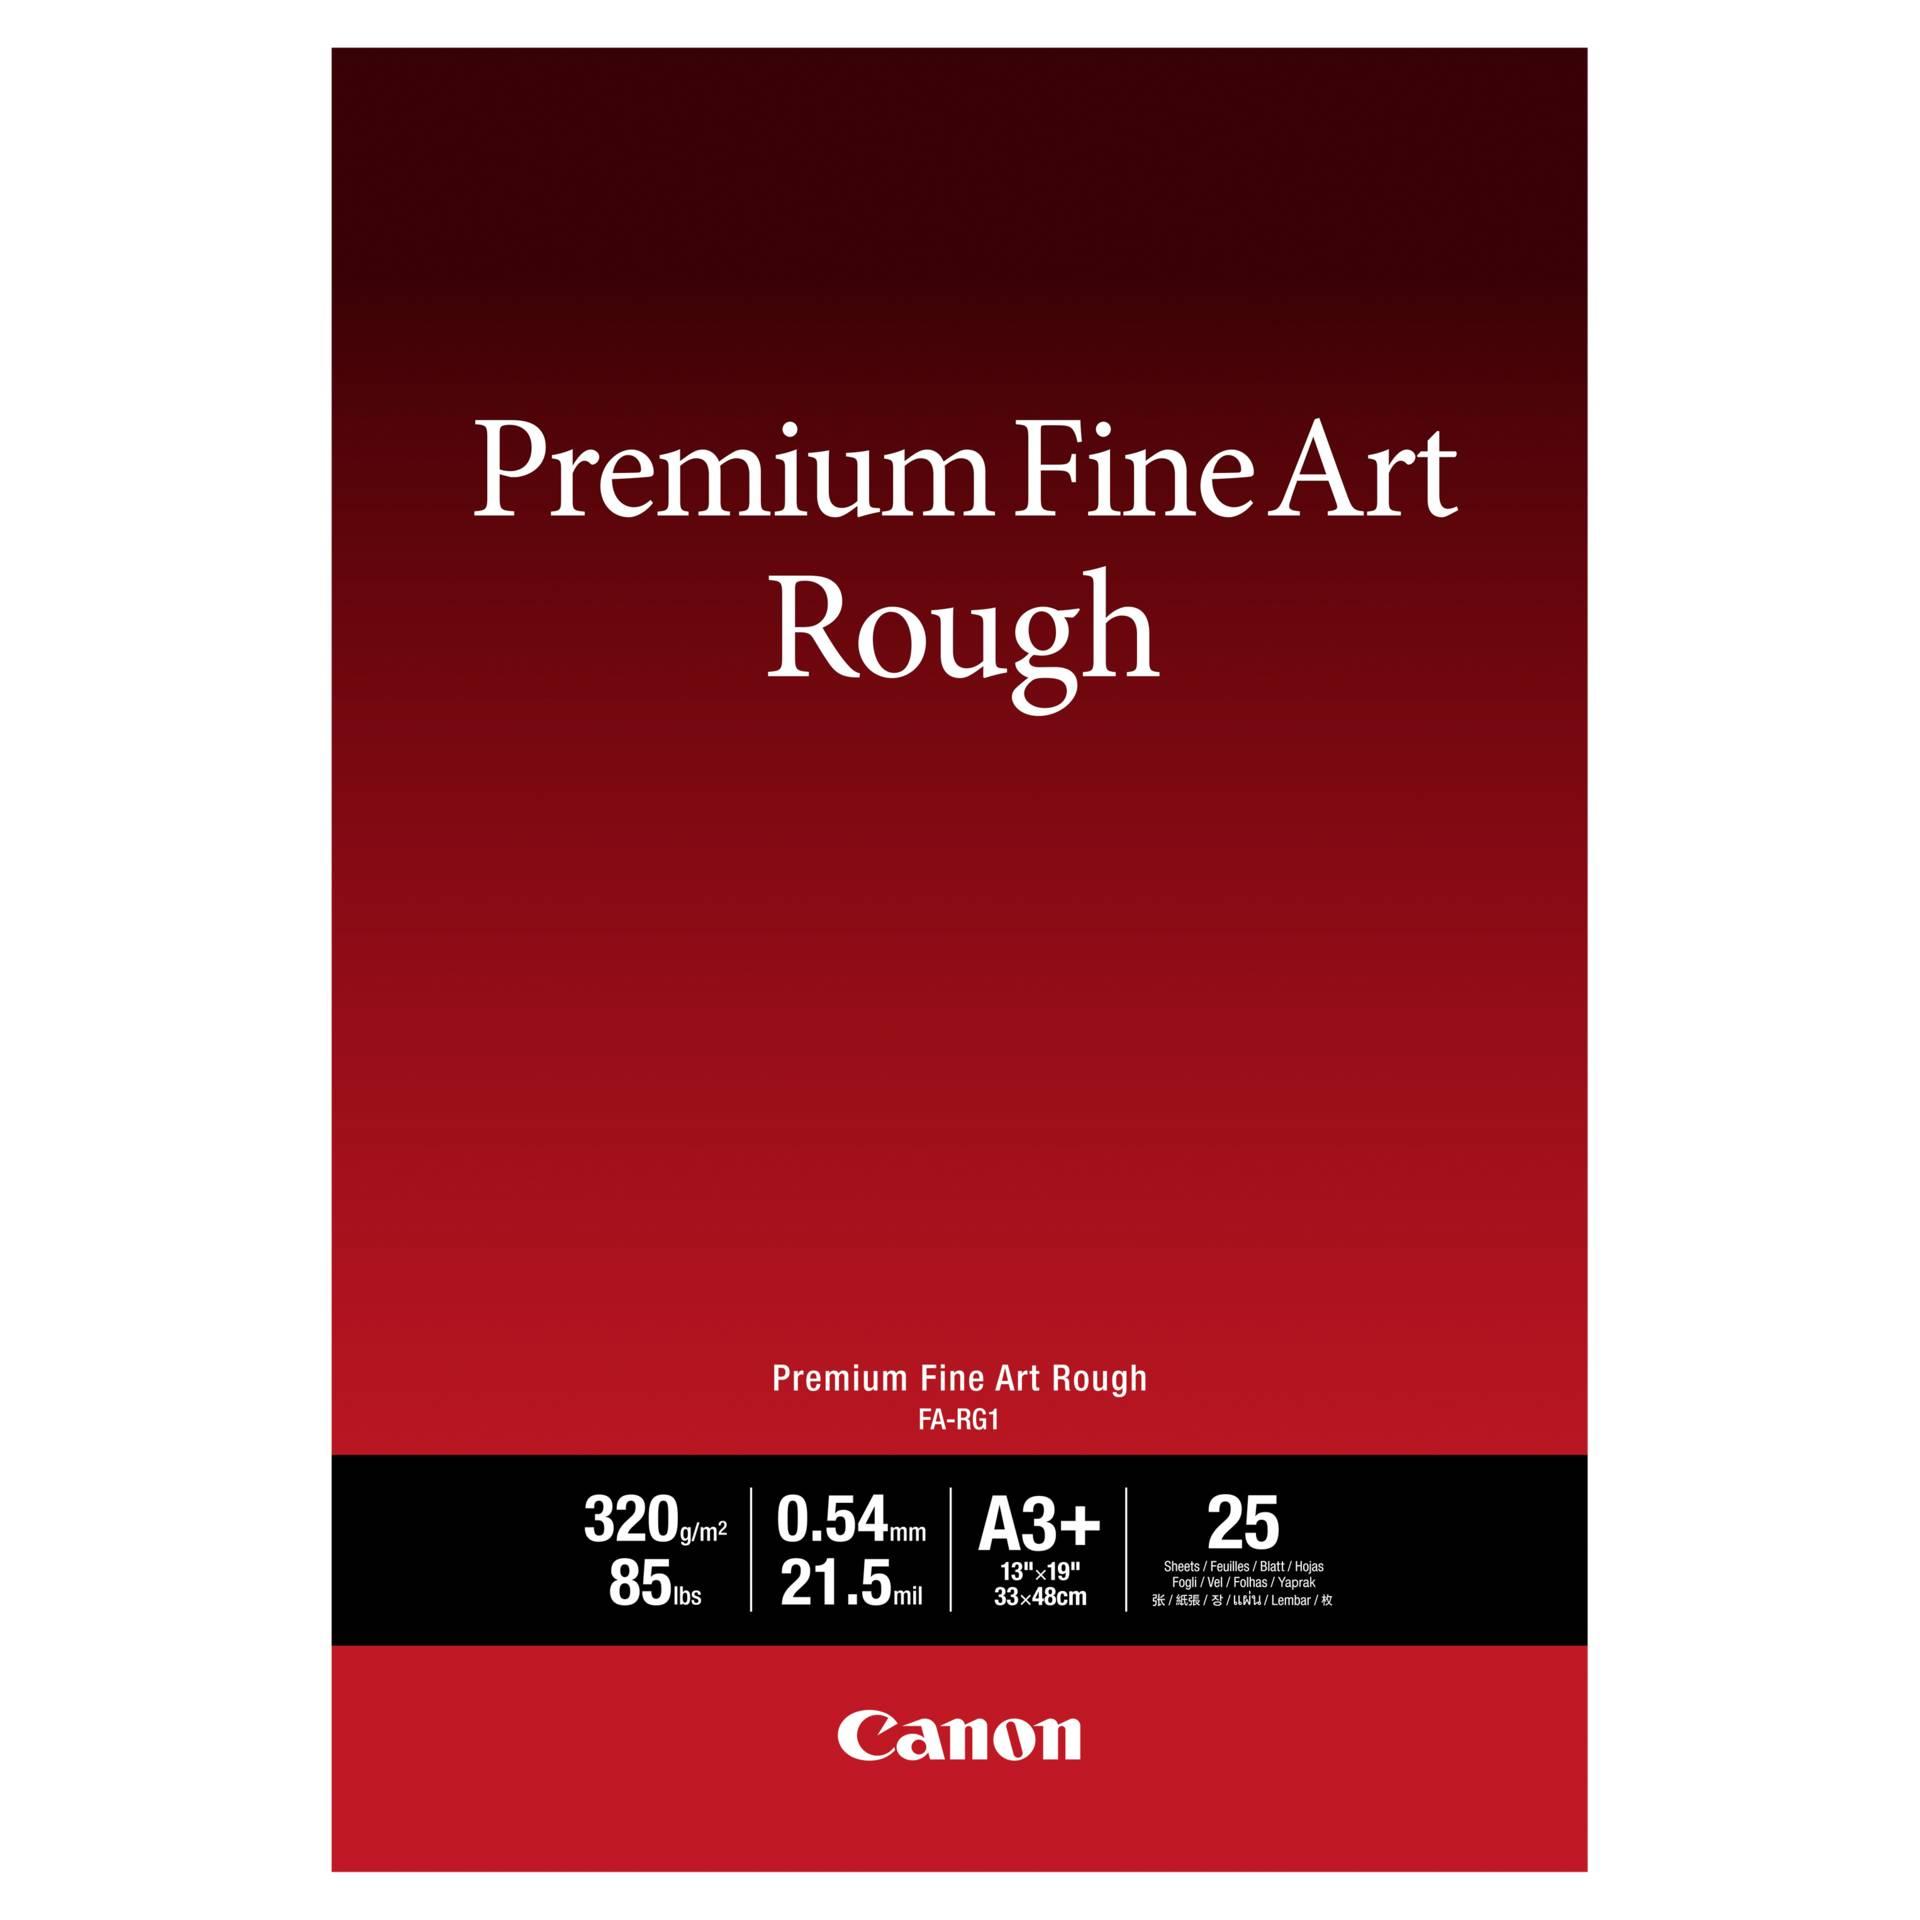 Canon FA-RG1 Premium Fine Art Rough A3+ 320g (25 sheets)